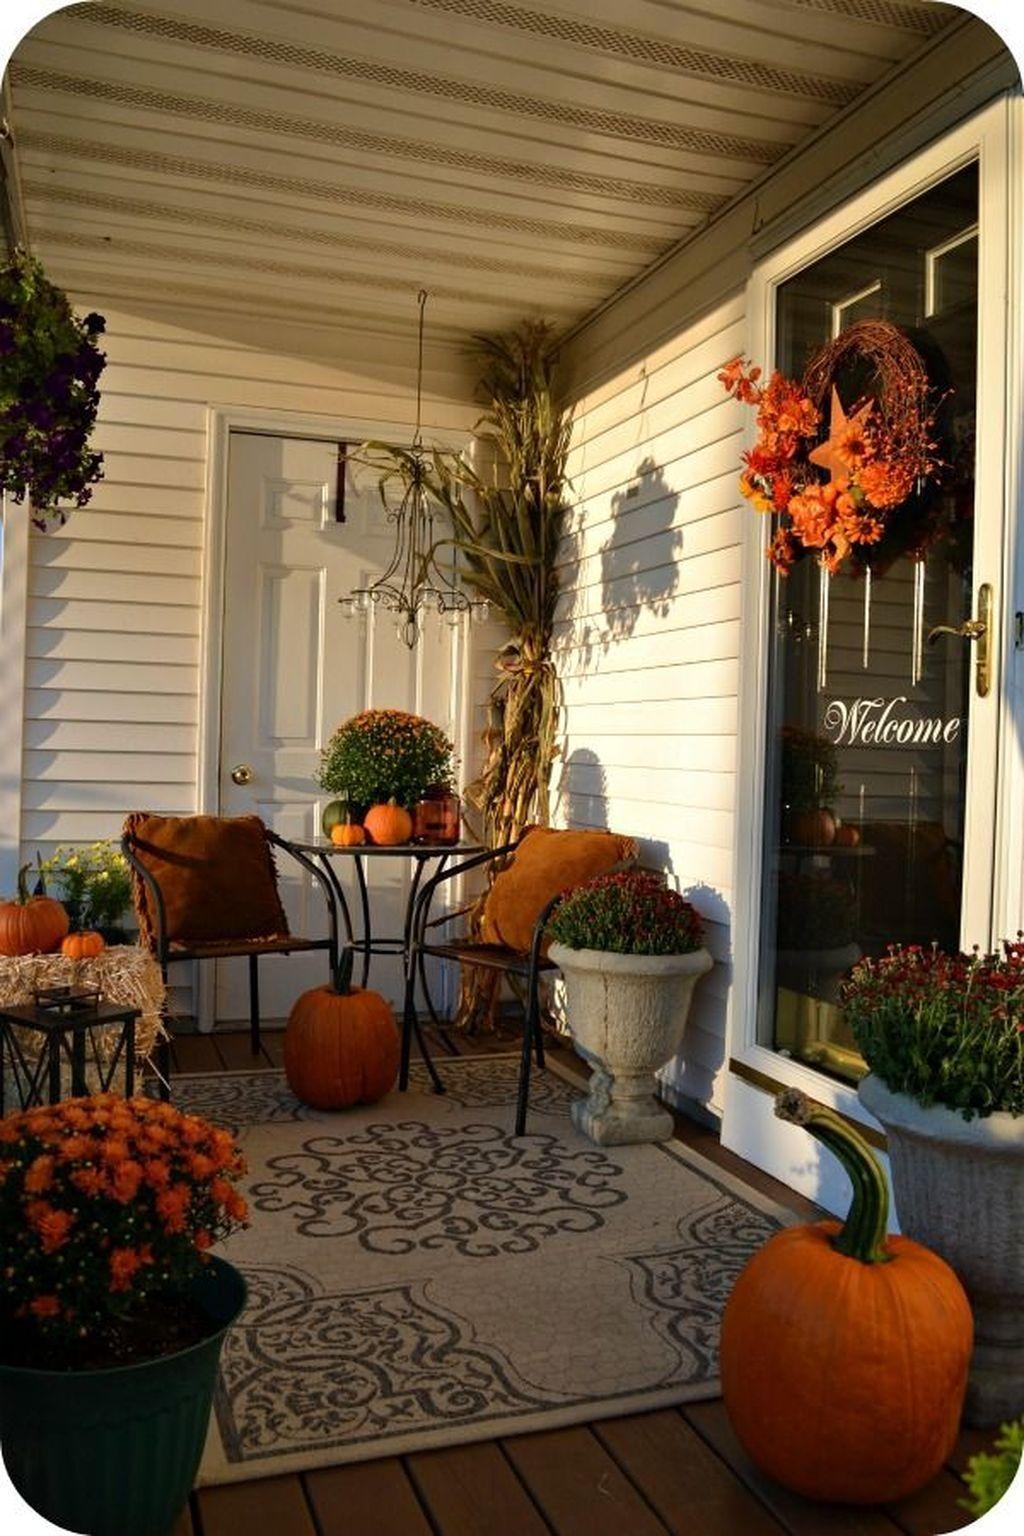 20 Totally Stunning Farmhouse Porch Decoration Ideas Trendhmdcr Fall Decorations Porch Autumn Decorating Porch Decorating